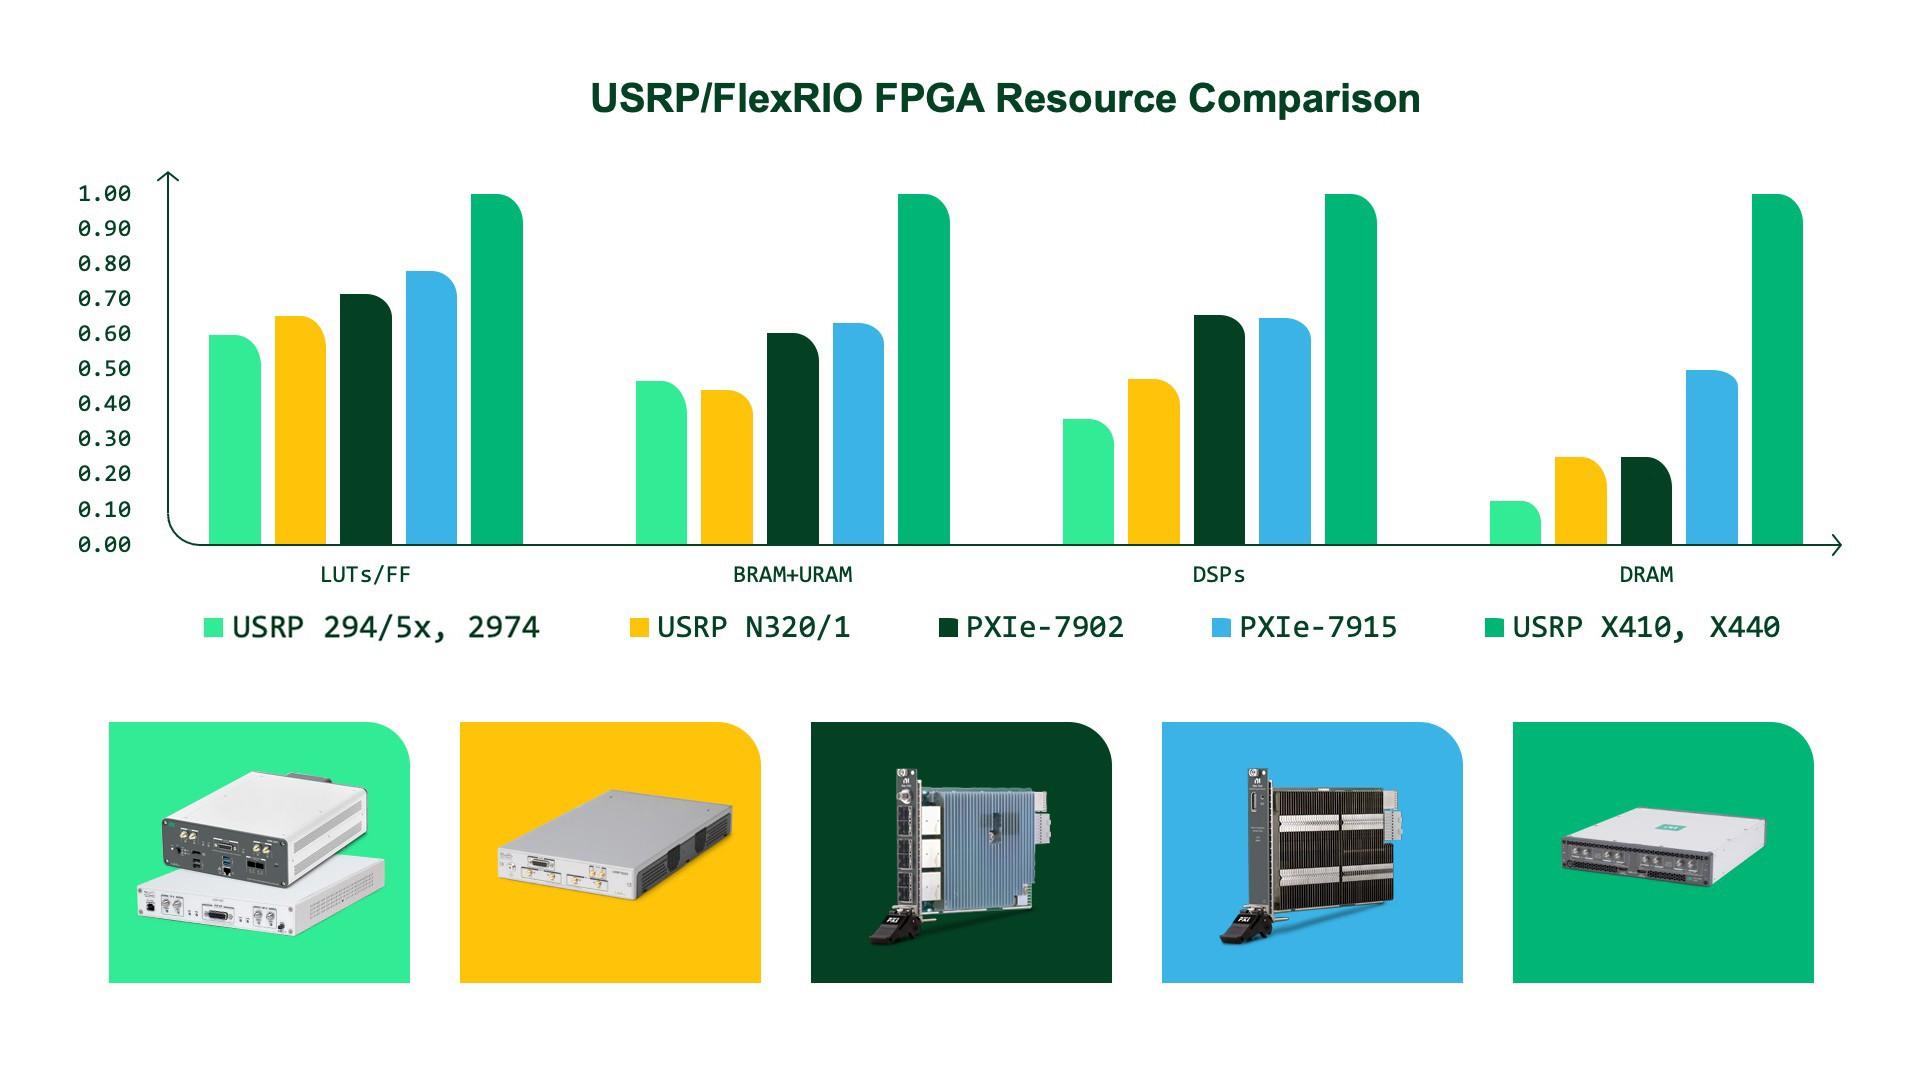 FPGA-enabled USRP devices